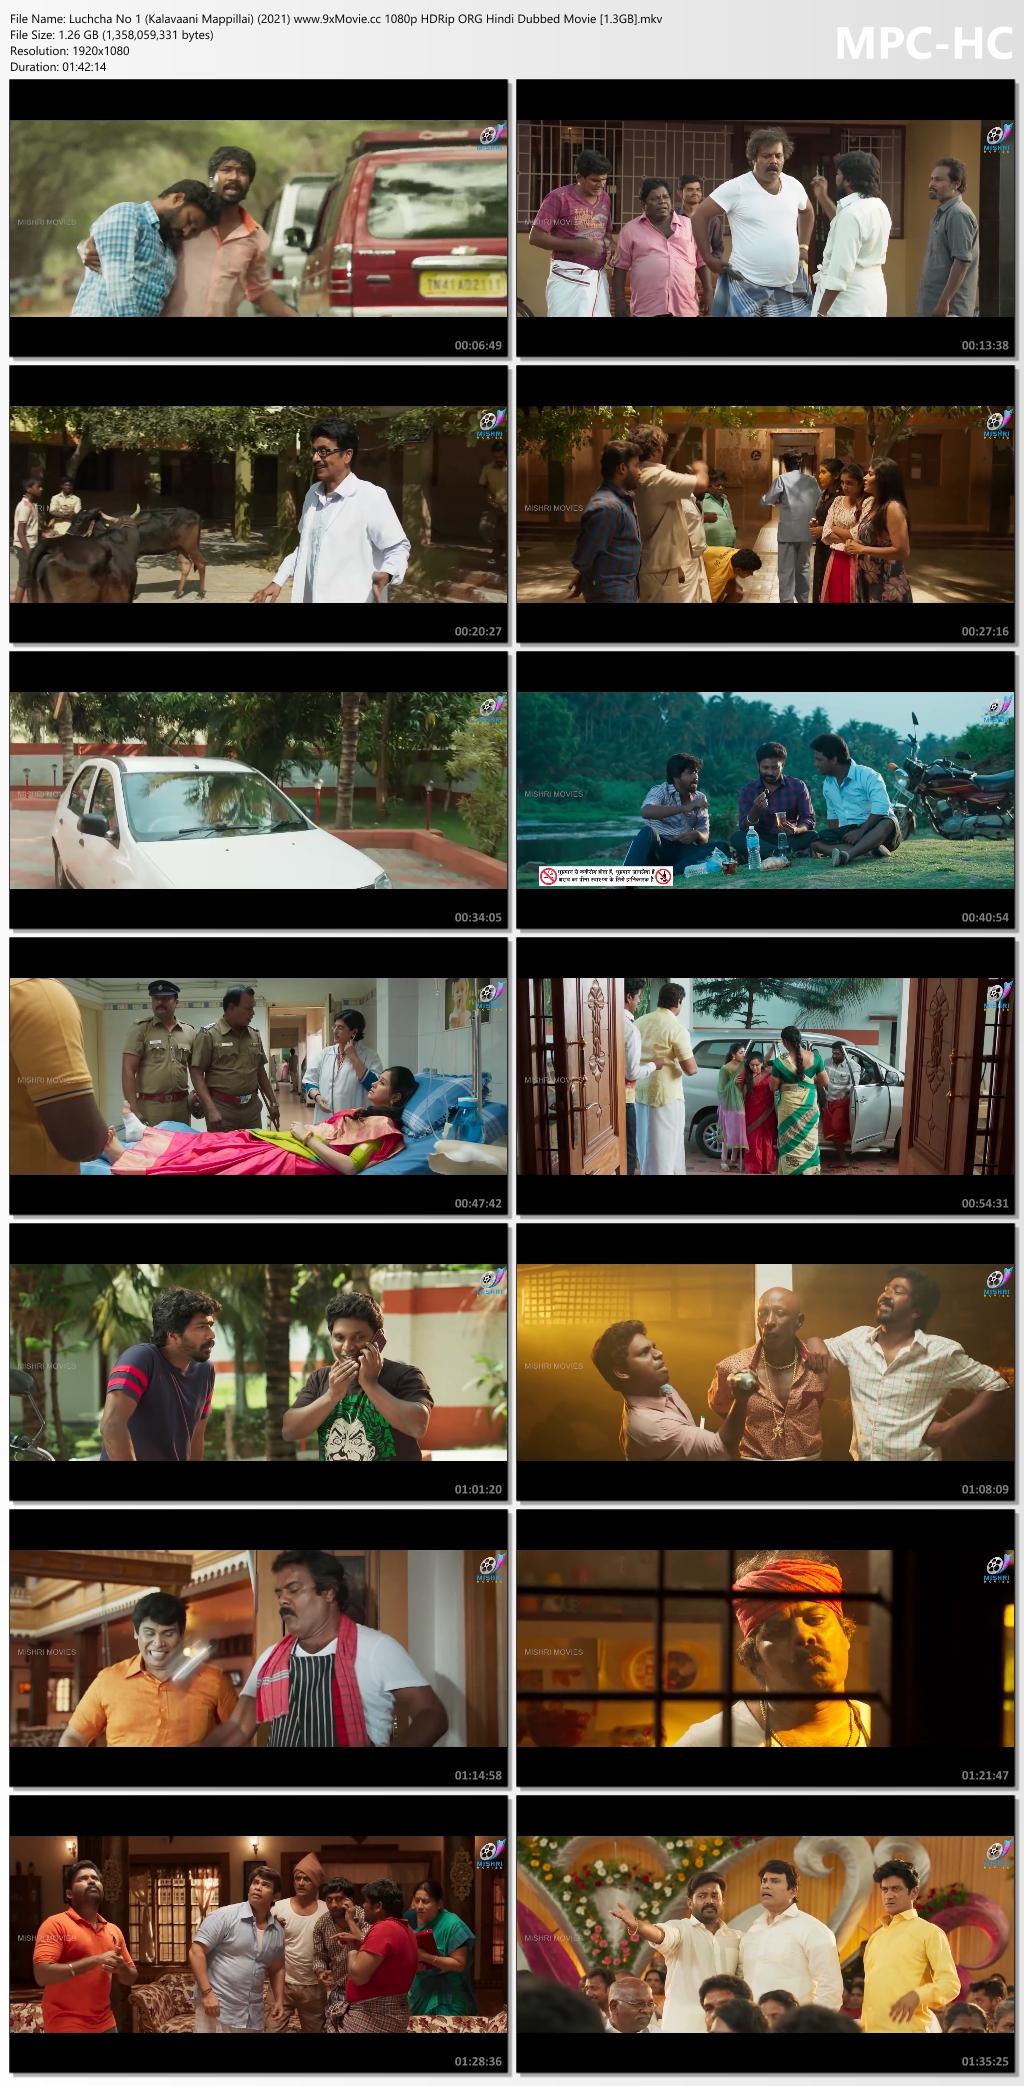 Luchcha-No-1-Kalavaani-Mappillai-2021-www-9x-Movie-cc-1080p-HDRip-ORG-Hindi-Dubbed-Movie-1-3-GB-mkv